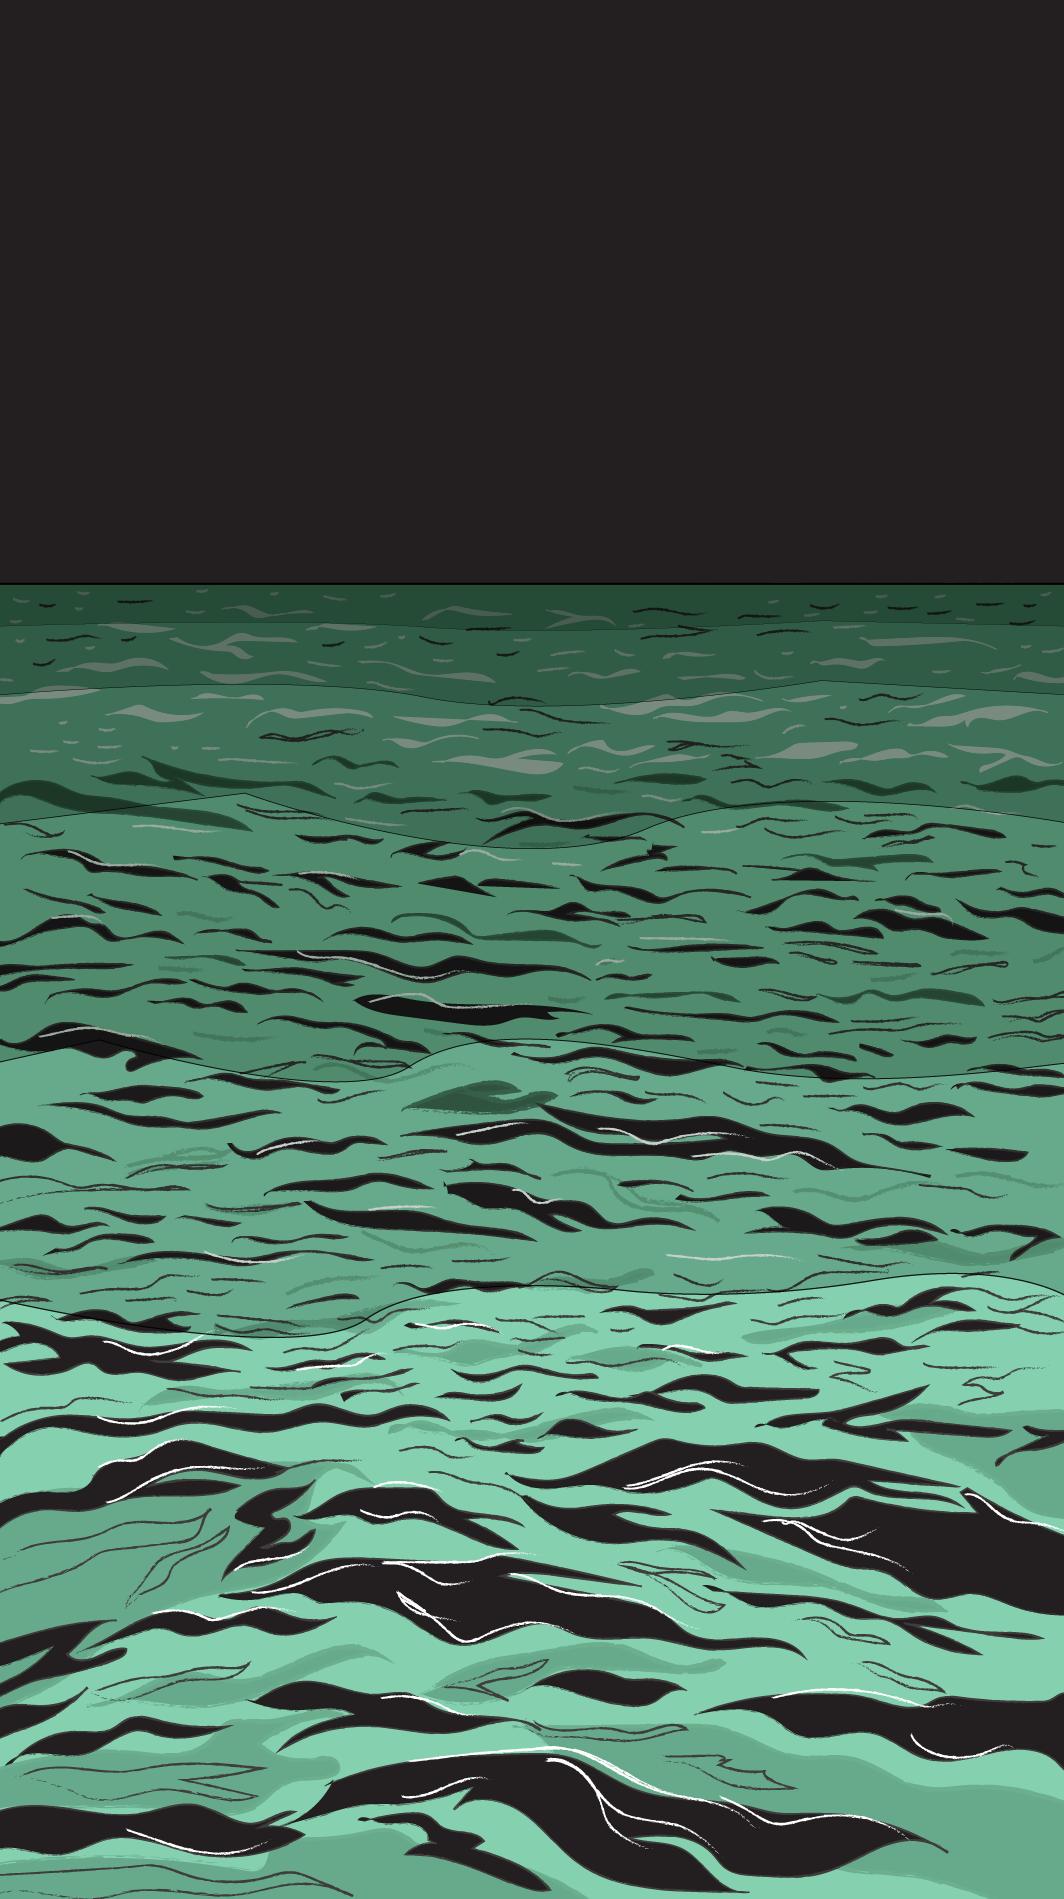 Unison_2_SeaHorizon-02-01.png